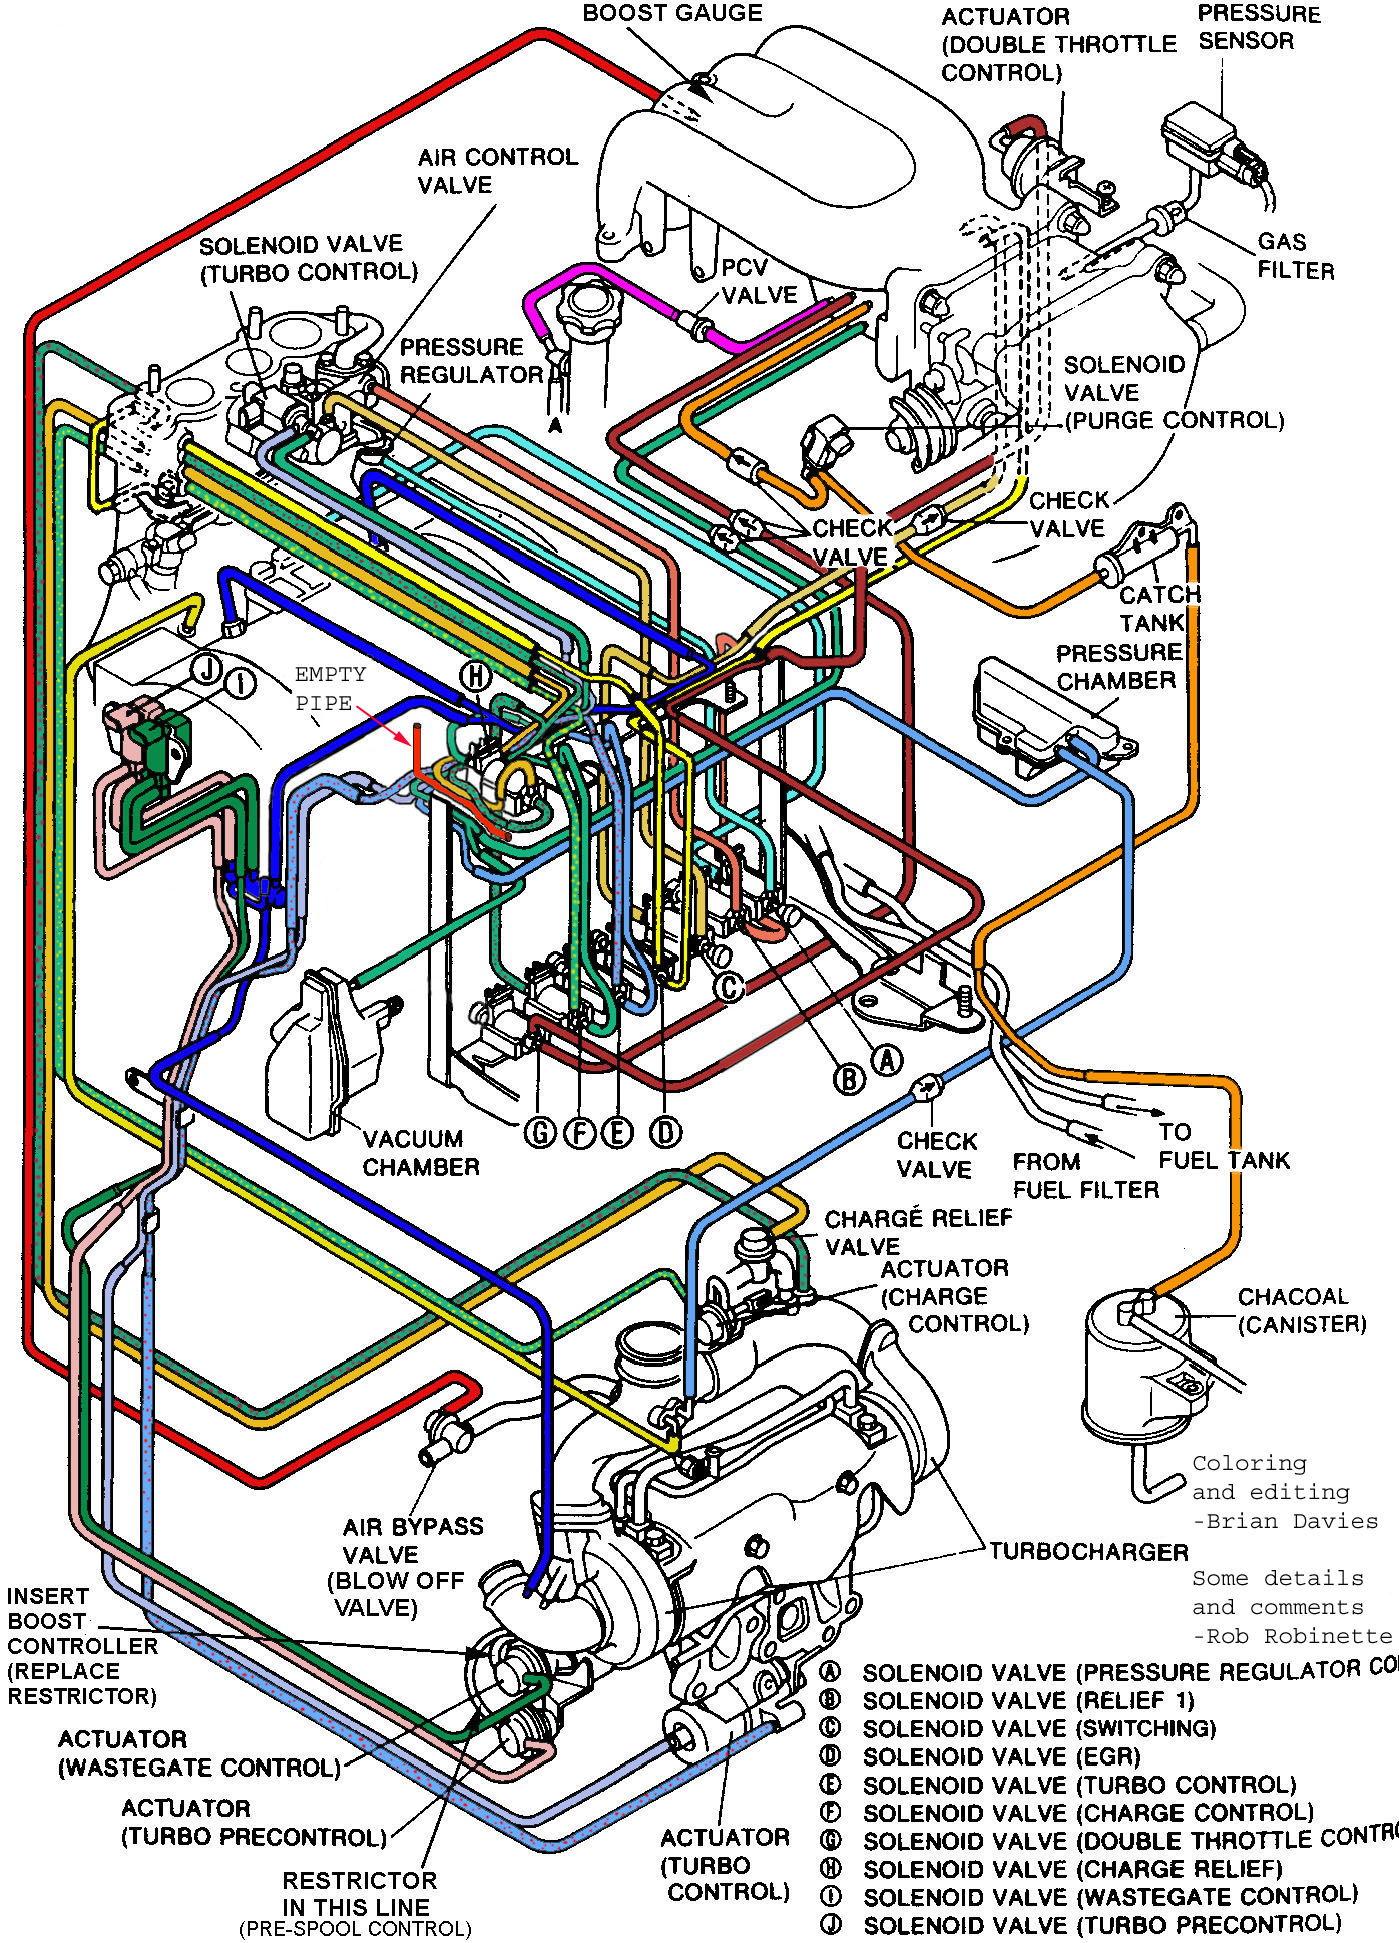 80 vacuum_hose_diagram2_b485e90da490ae0b2226abbe43825018bd3a8db4 jw pro jay intake manifolds rx7club com mazda rx7 forum  at panicattacktreatment.co